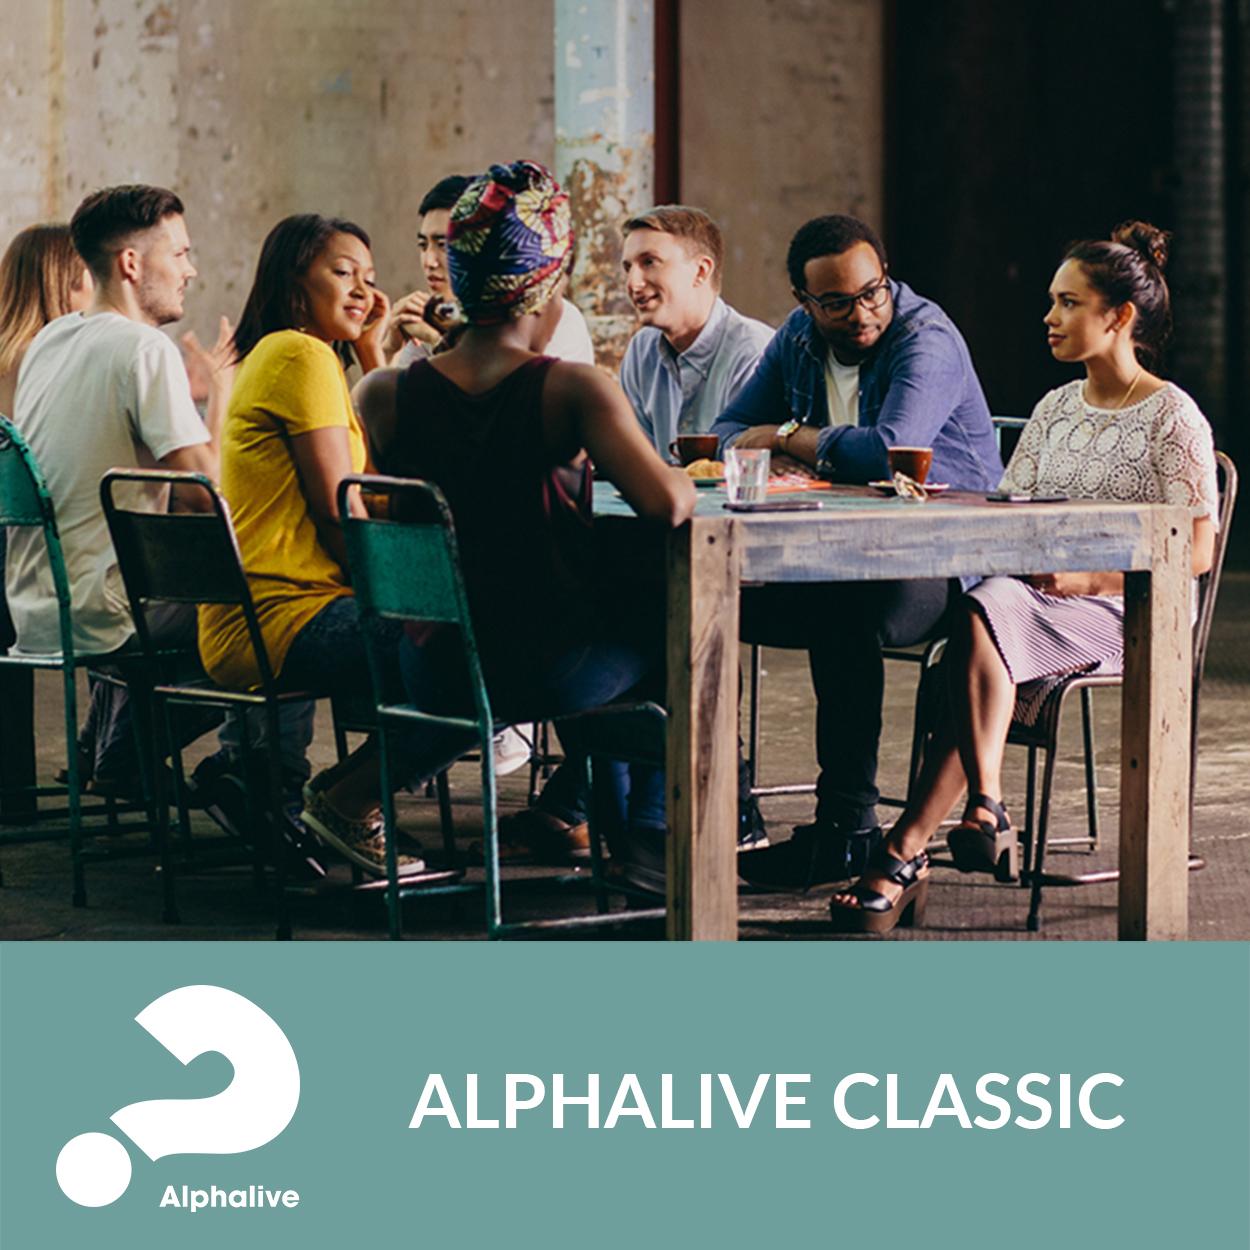 alphalive_classic.jpg